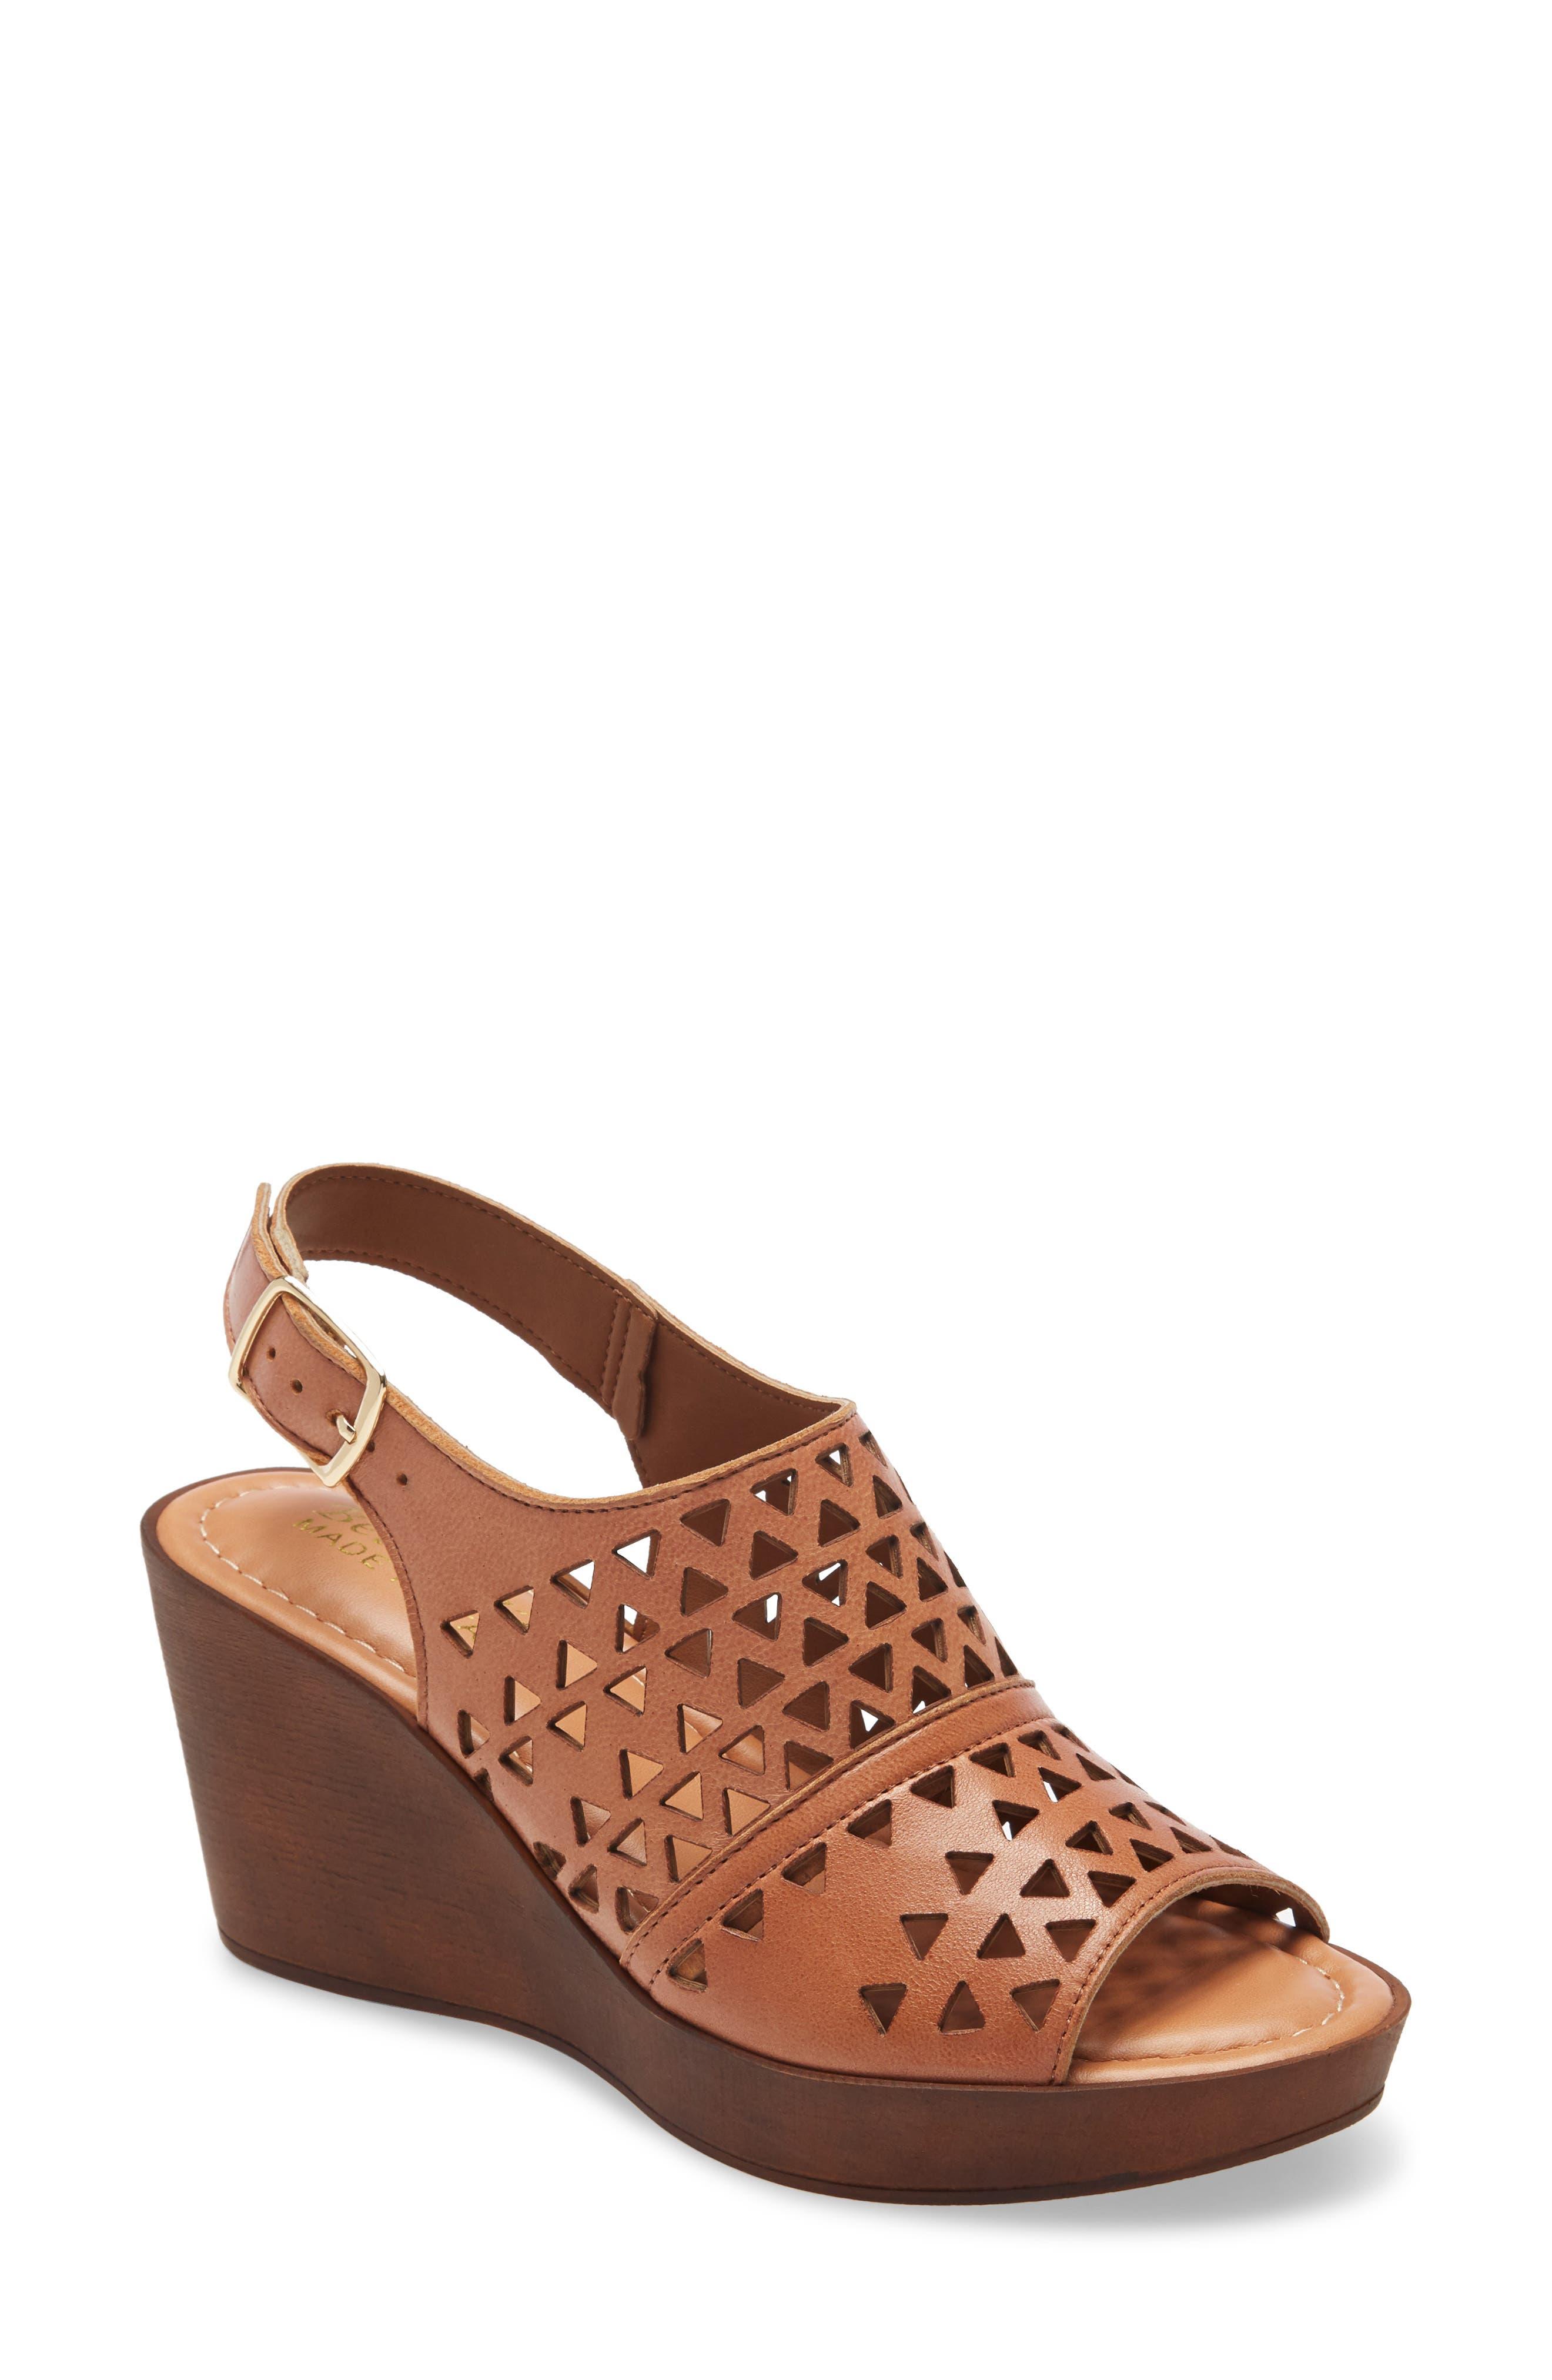 Triangular cutouts perforate the vamp of a sleek slingback sandal set on a chunky woodgrain platform wedge. Style Name: Bella Vita Italy Cutout Slingback Sandal (Women). Style Number: 5984401. Available in stores.